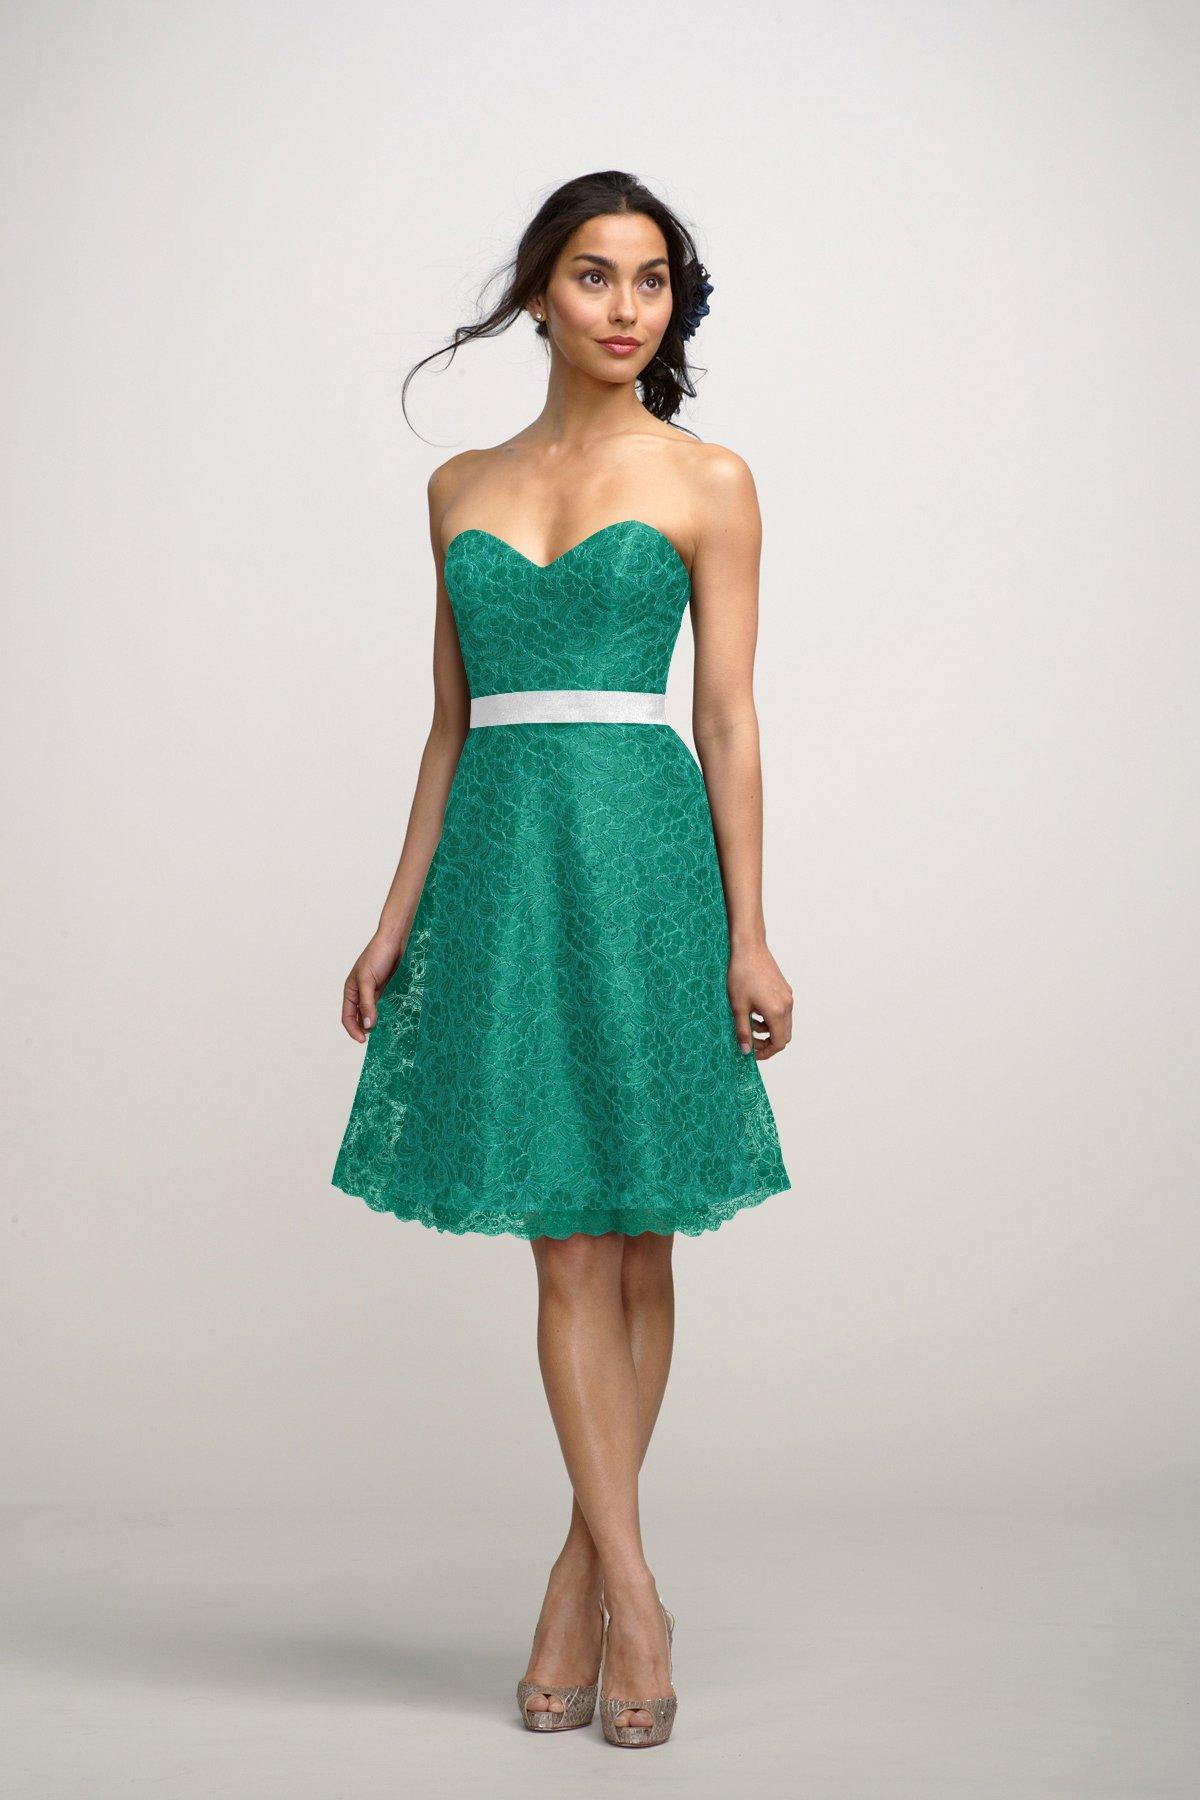 Aqua Green Short Sweetheart bridesmaid dress with belt